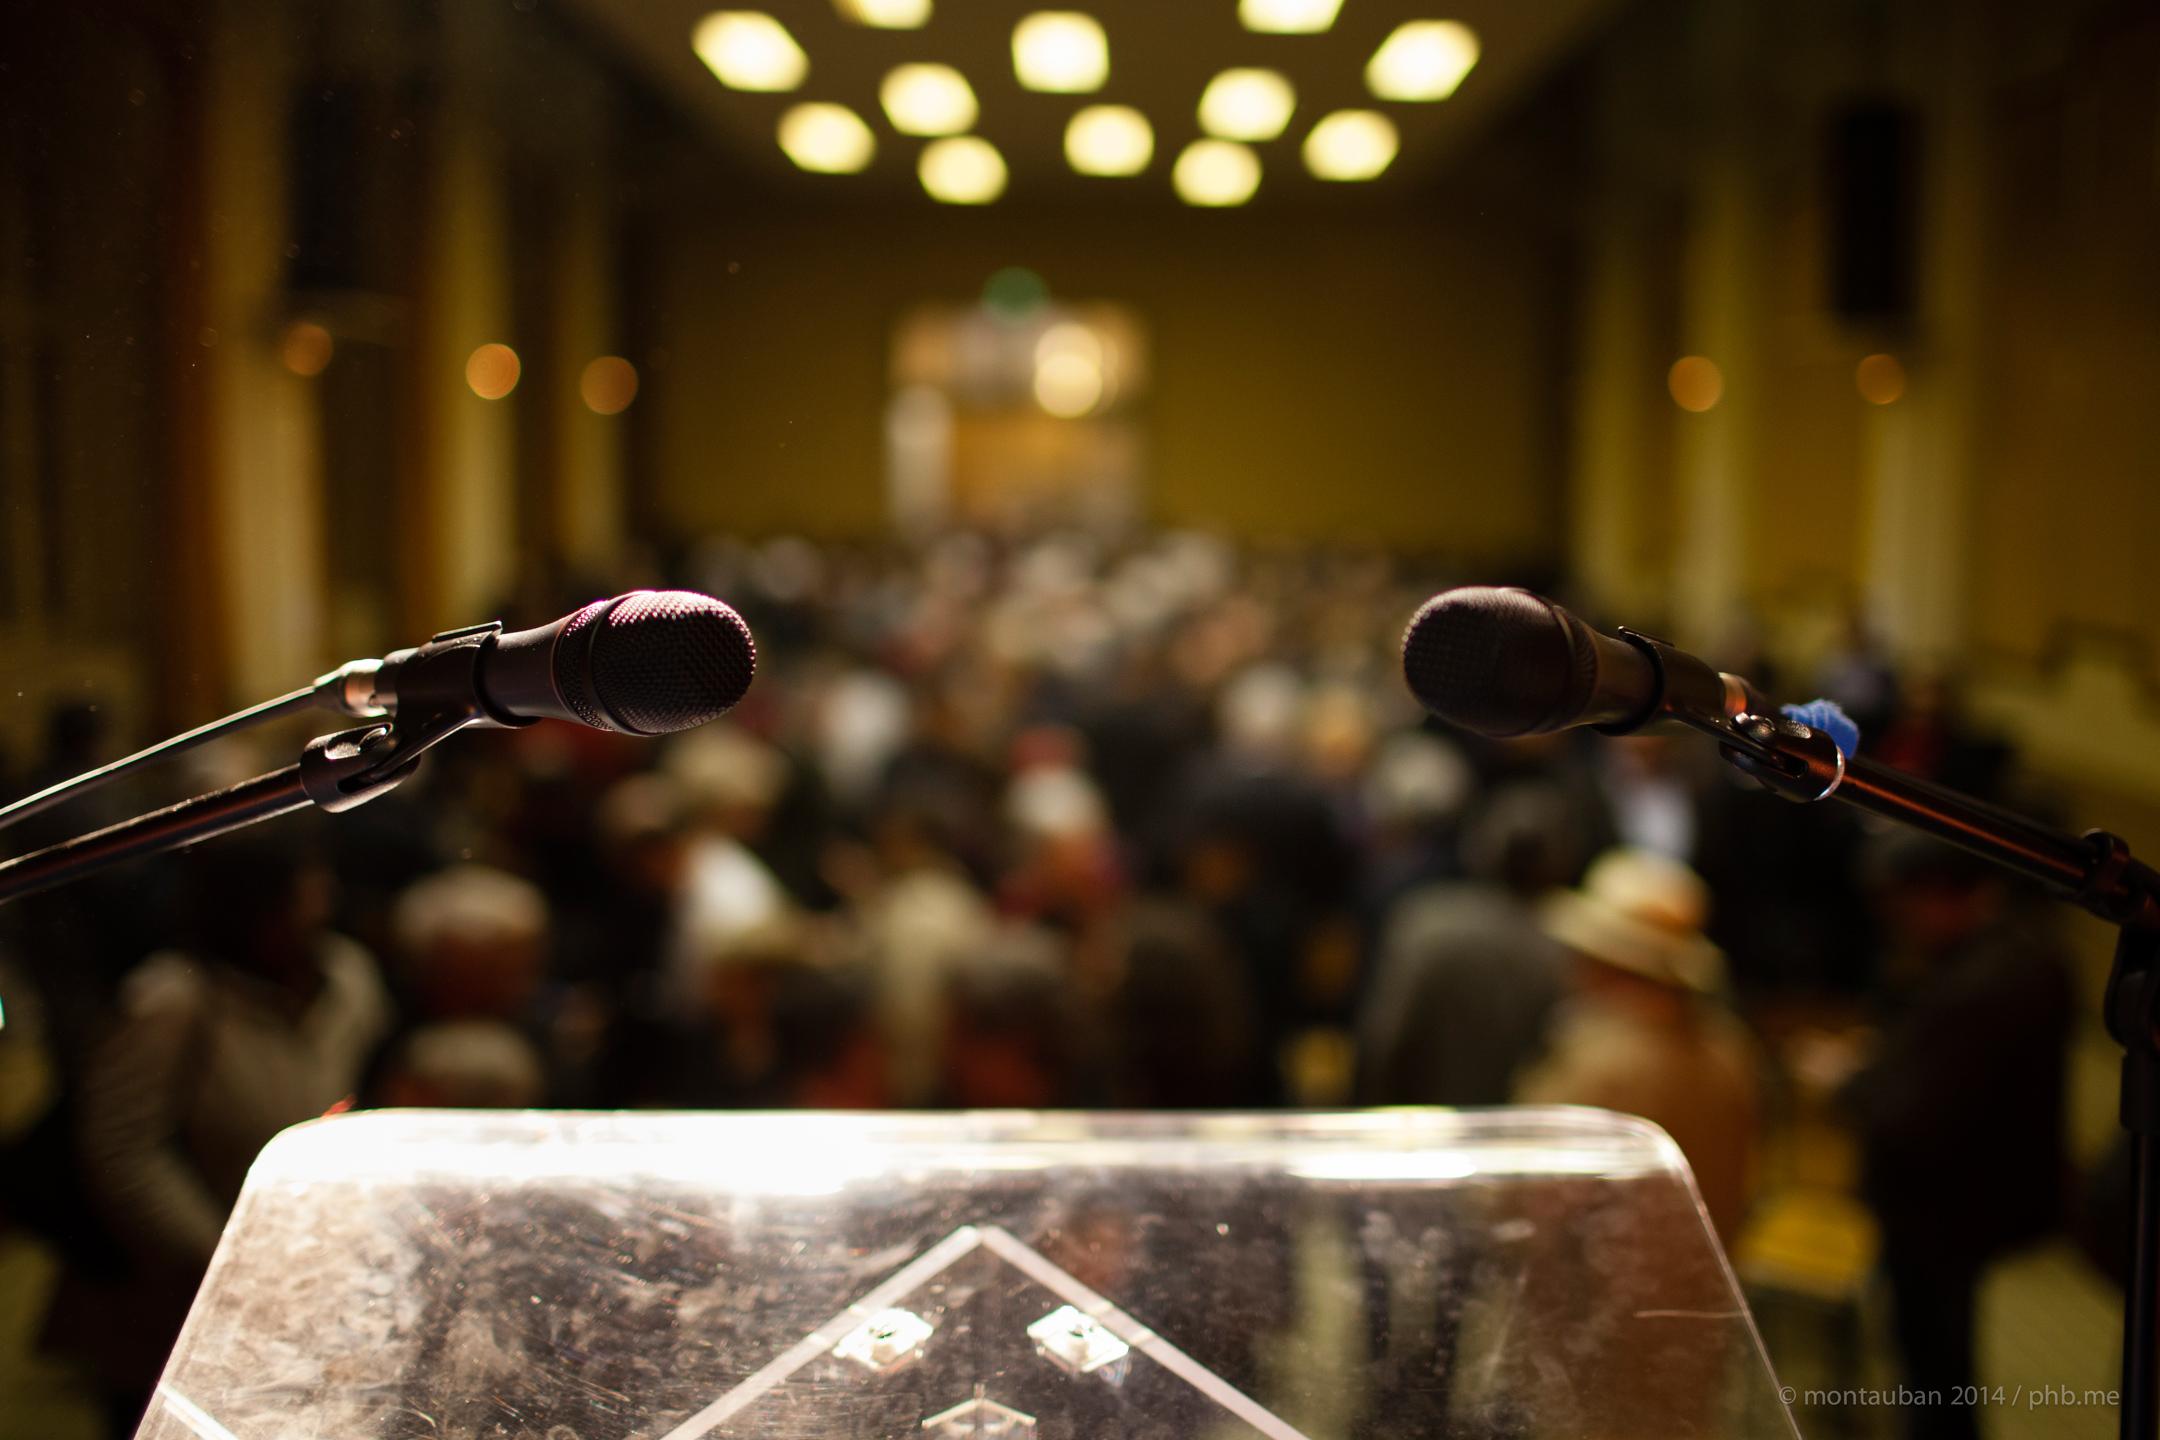 Montauban-2014-Rassemblement-peuple-gauche-vote-IMG_3414